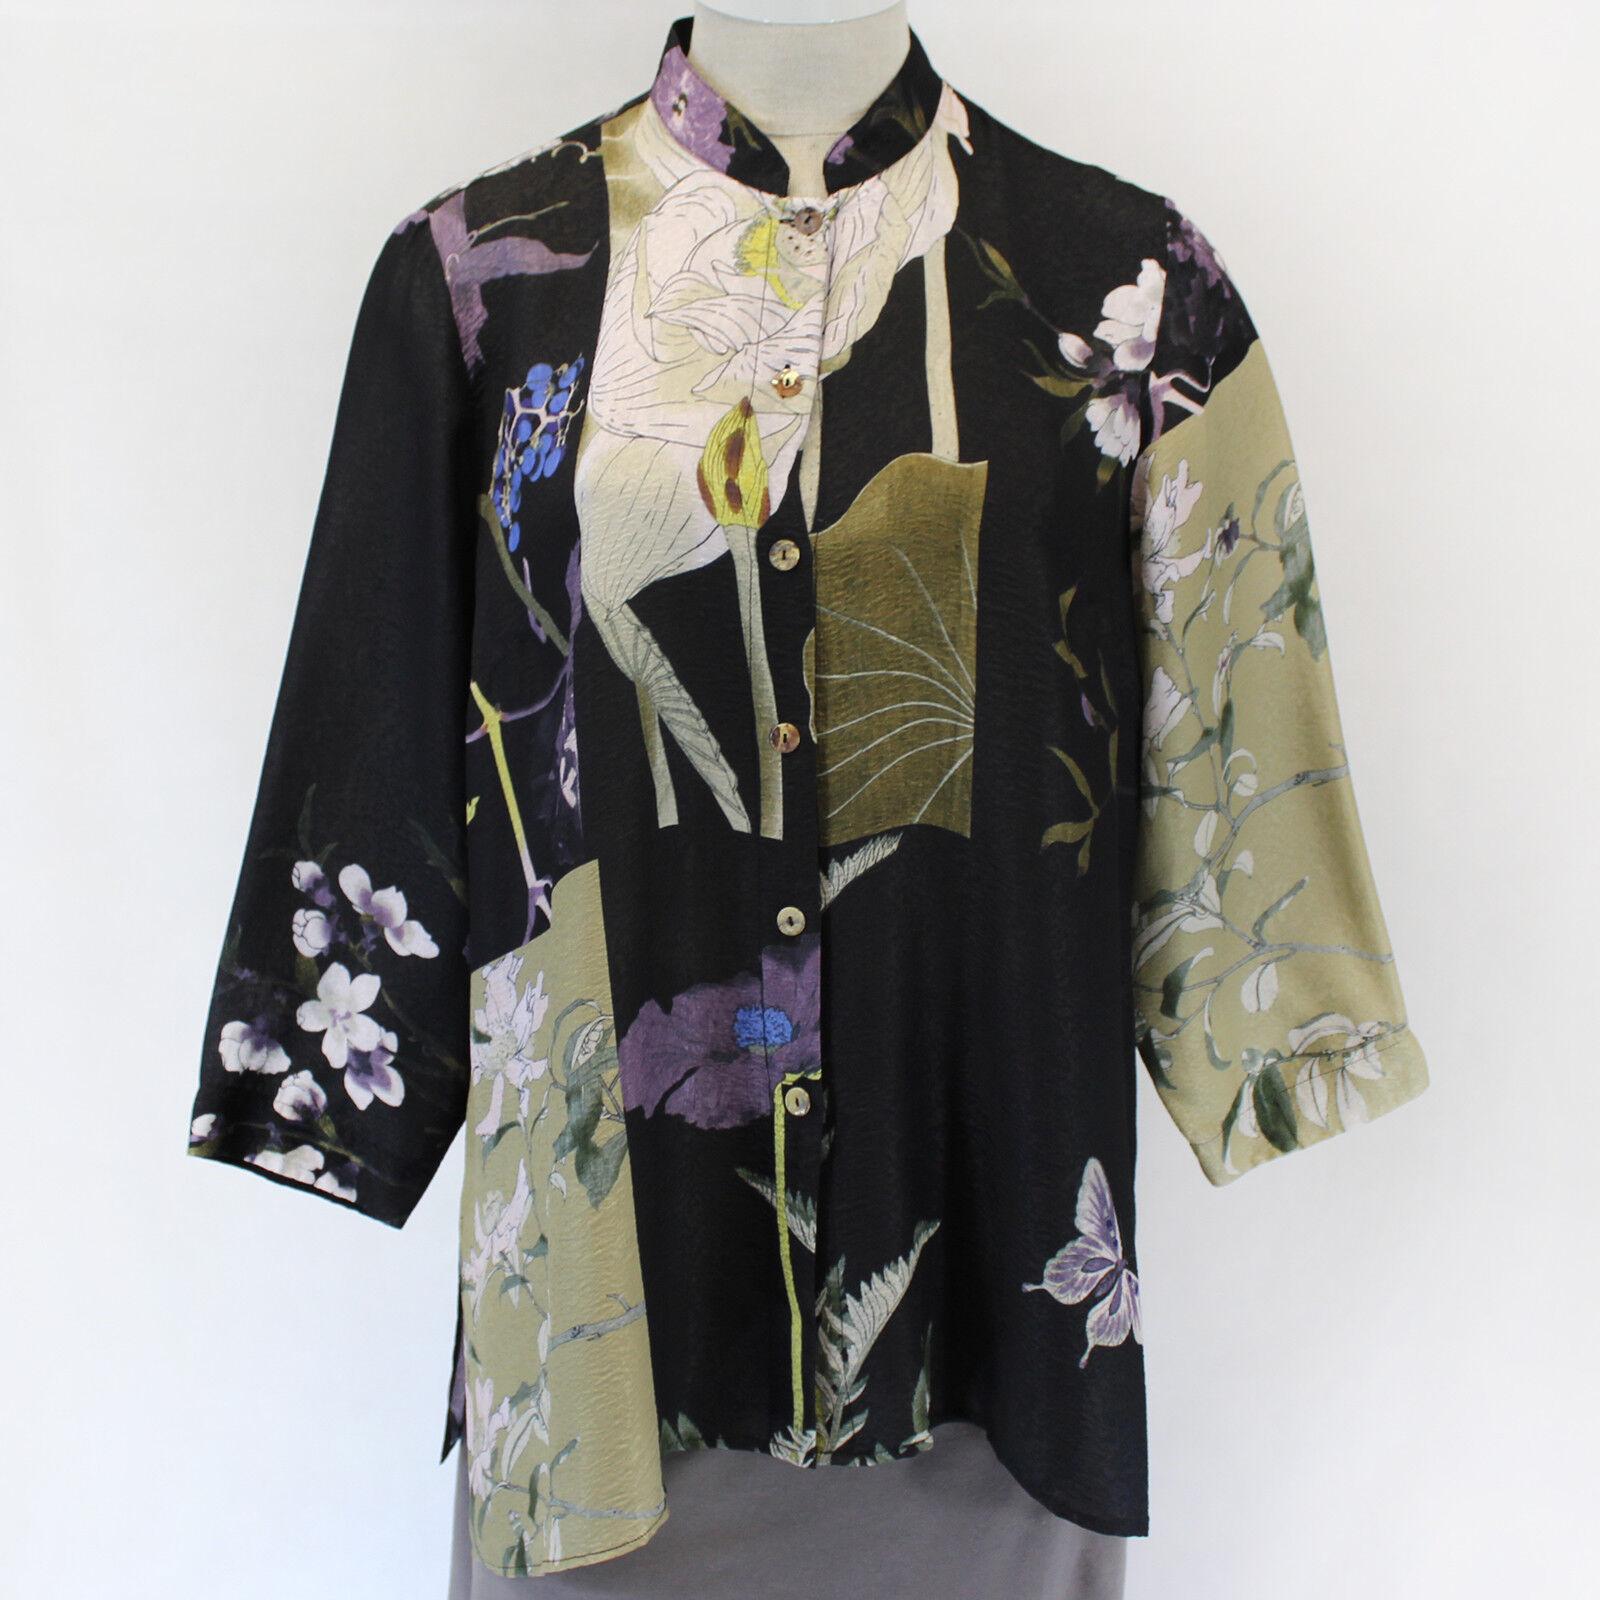 Citron Clothing Japanese Art Flowers Butterflies Silk Blend Blouse Plus 1X